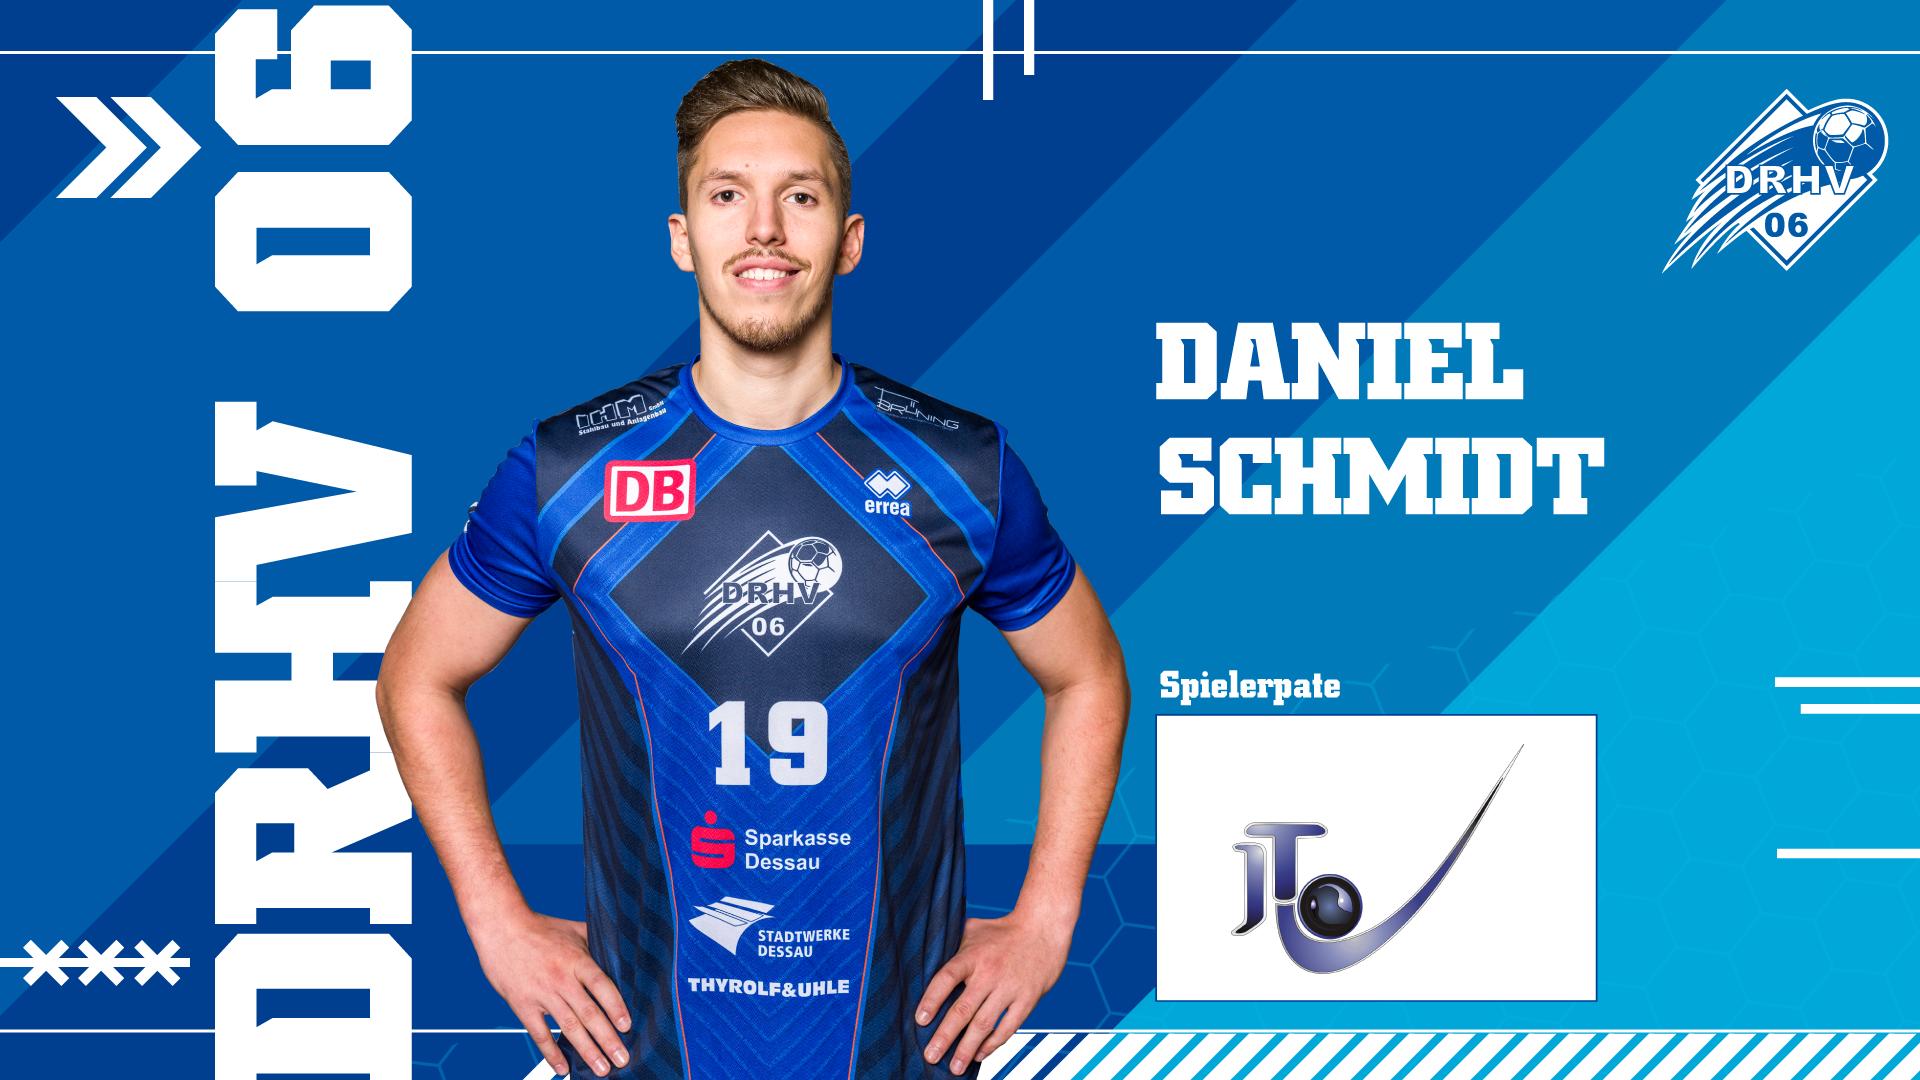 Spielerpatenschaft Daniel Schmidt